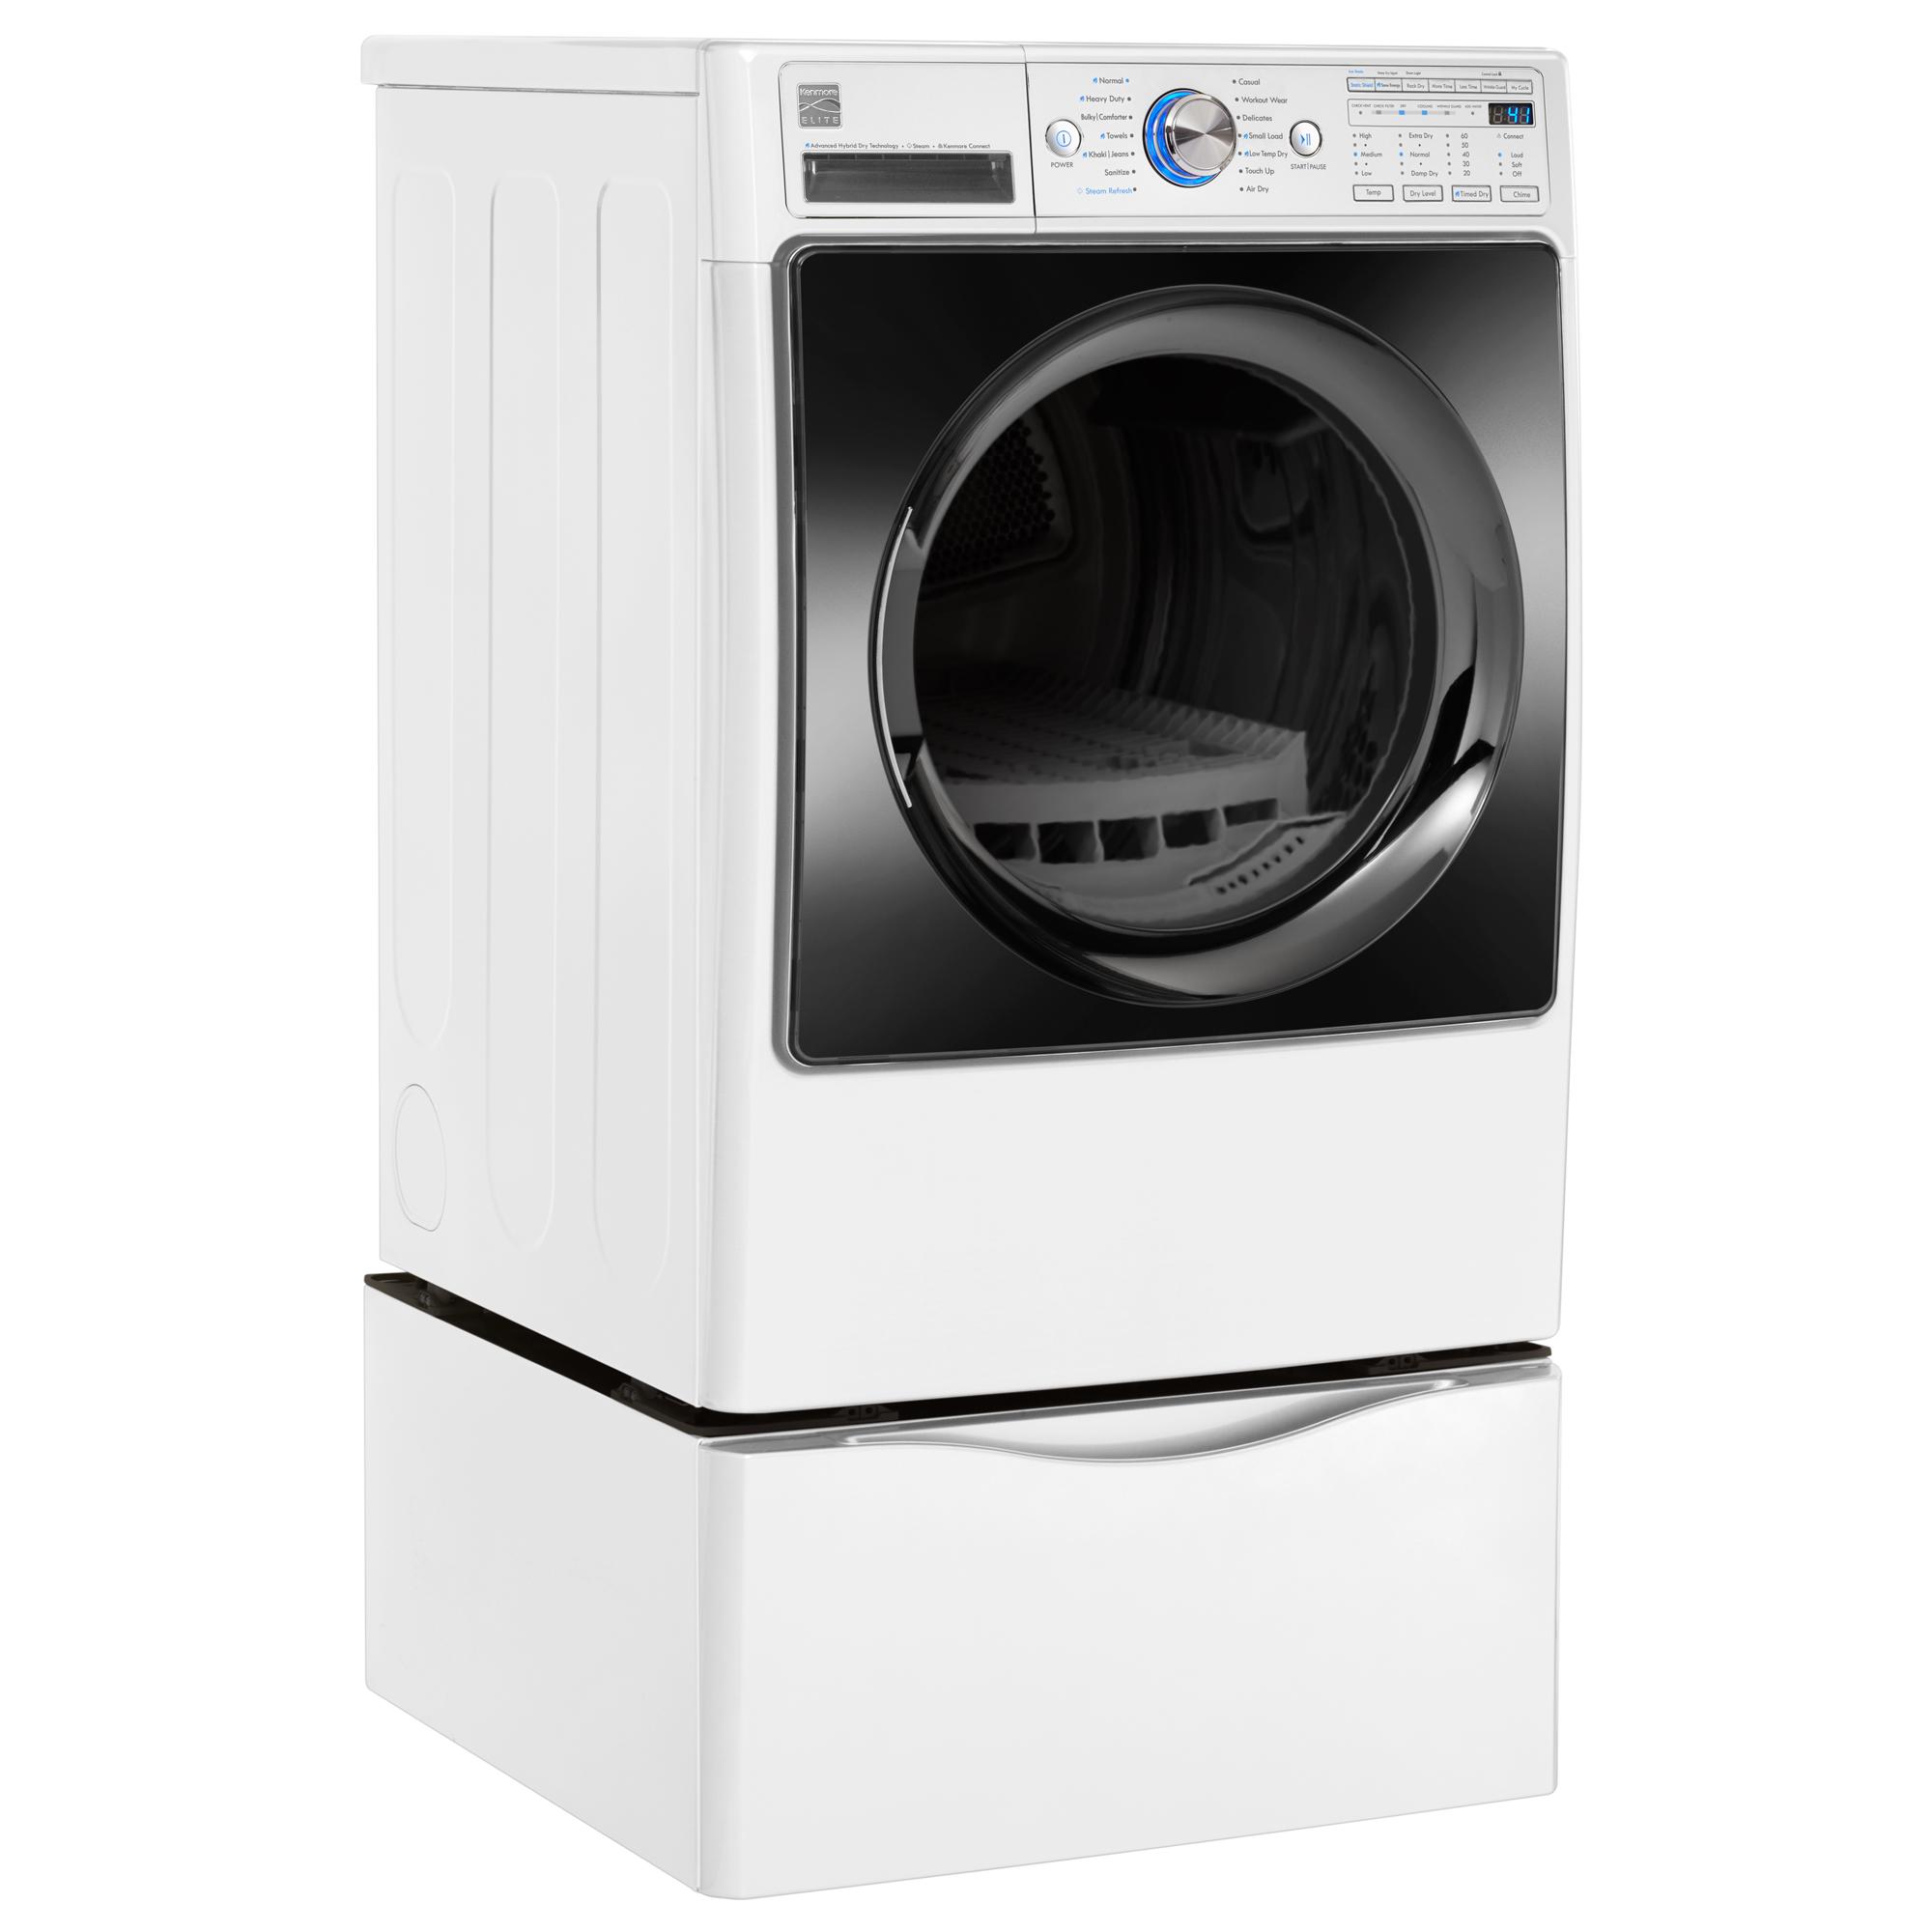 Kenmore Elite 81592 7.3 cu. ft. Advanced Hybrid Dry Technology (Heat Pump) Electric Dryer w/ Steam – White